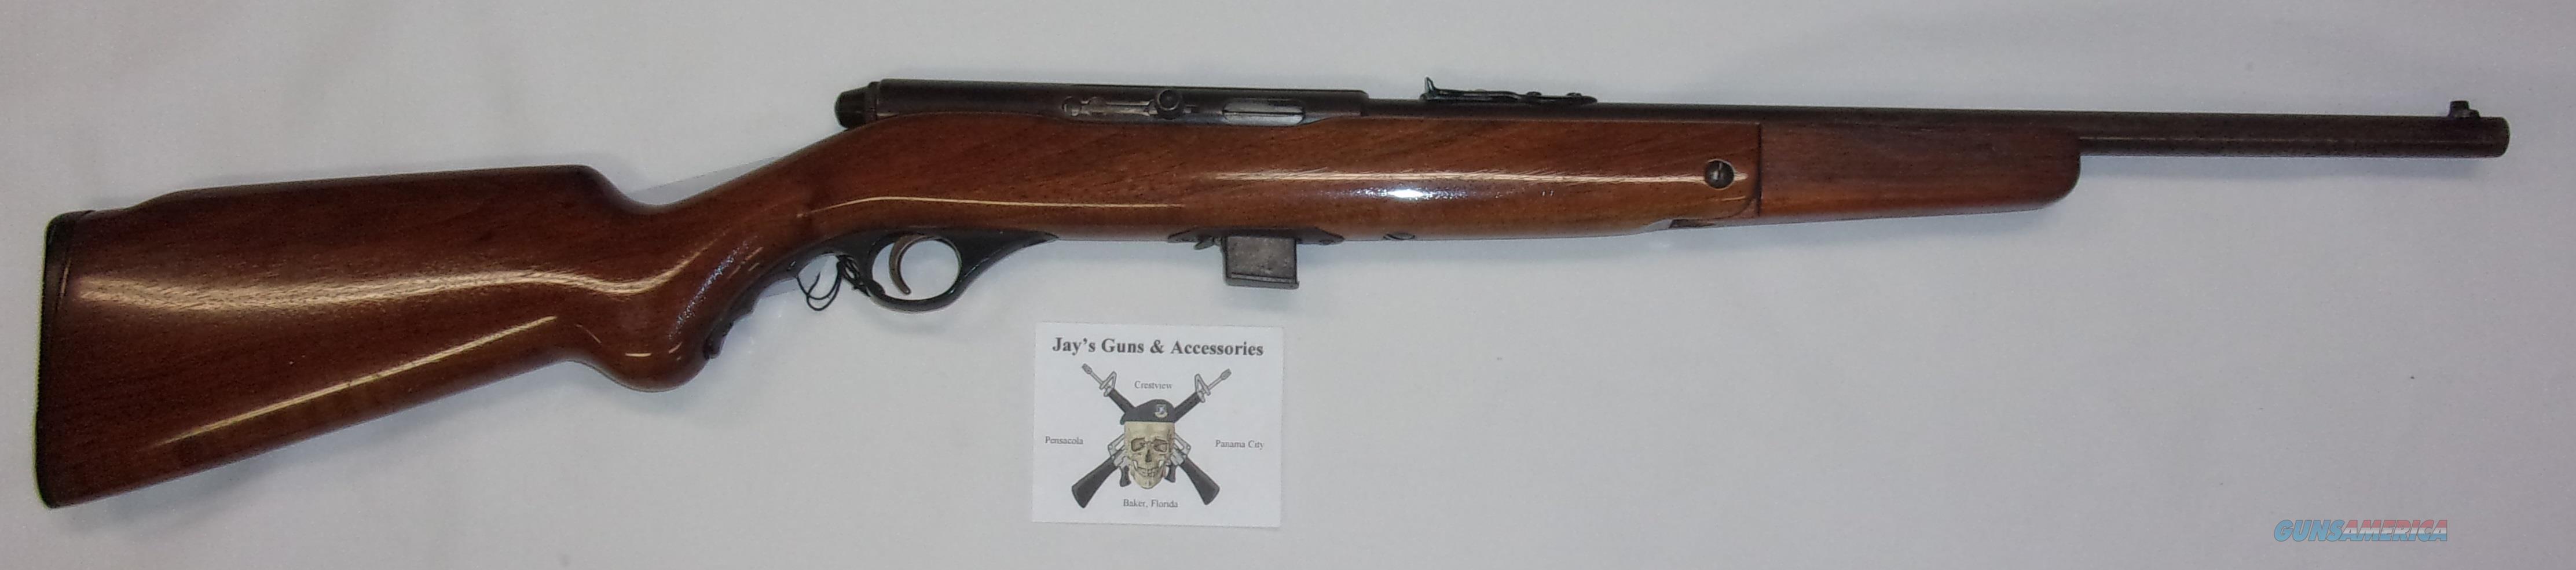 Mossberg 152K  Guns > Rifles > Mossberg Rifles > Auto-loading Rimfire